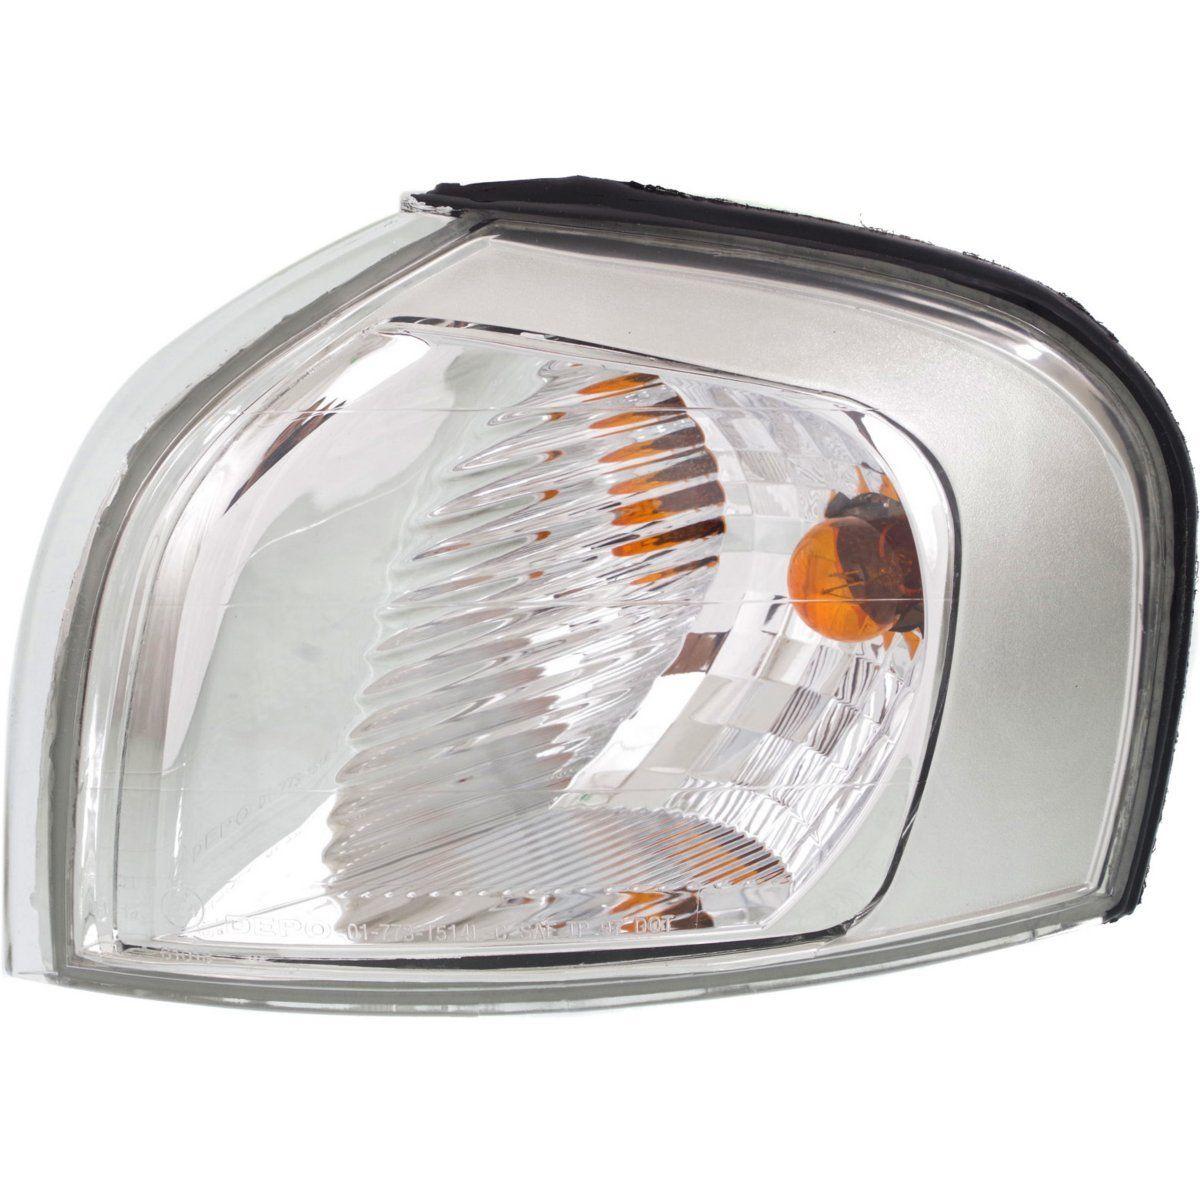 USコーナーライト Corner Light For 2004-2006 Volvo S80 w/ chrome trim Driver Side w/ Bulb Corner Light For 2004-2006 Volvo S80 w / chrome trimドライバーサイド(電球付き)